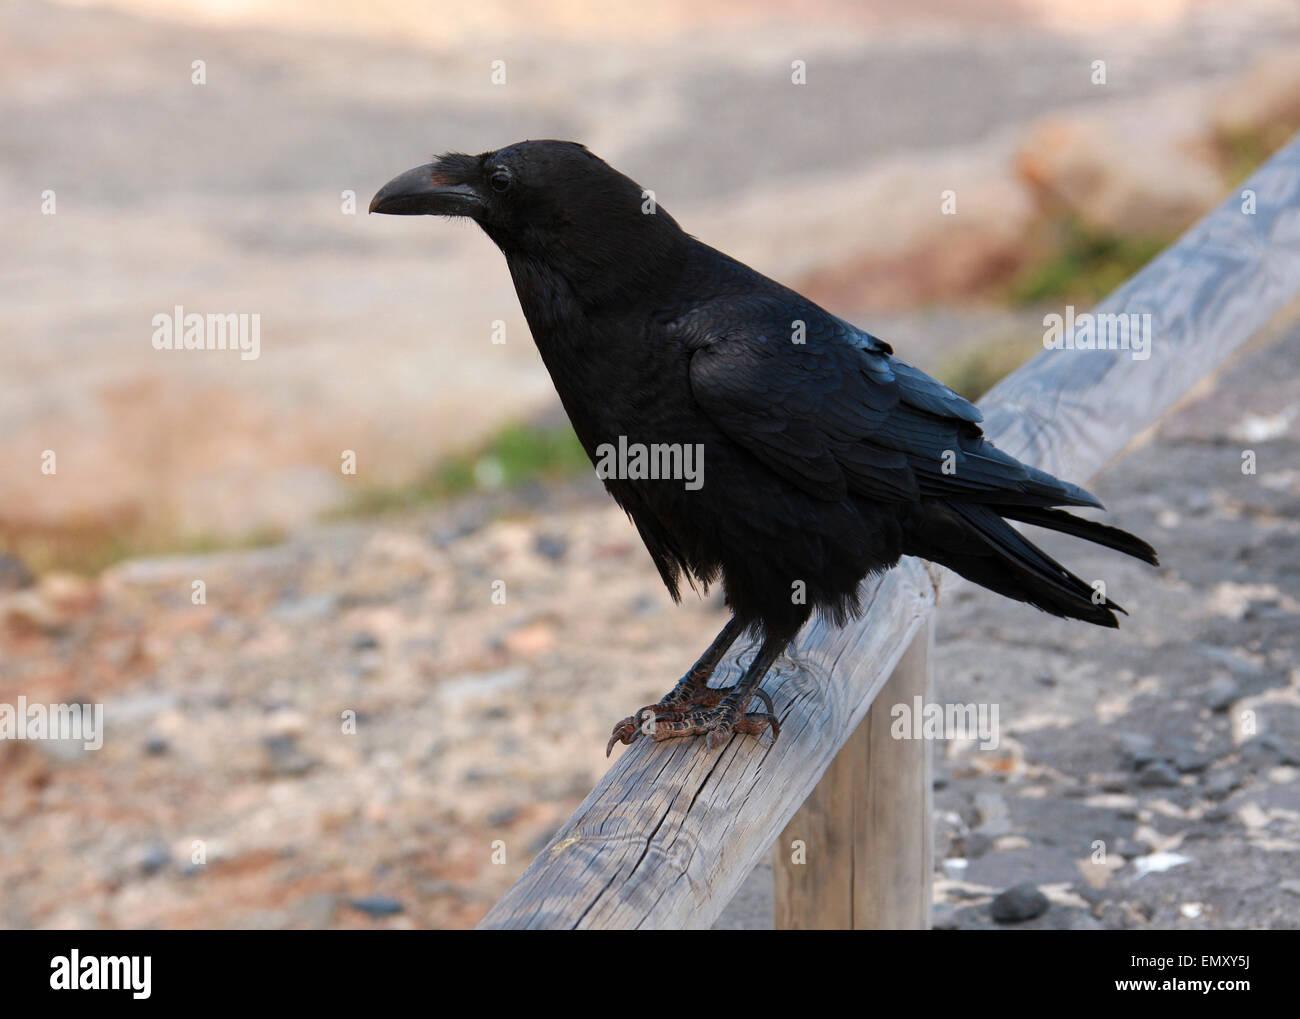 Kanarischen Inseln Rabe, Corvus Corax Jordansi (Sy C. c. Tingitanus), Rabenvögel. Stockfoto